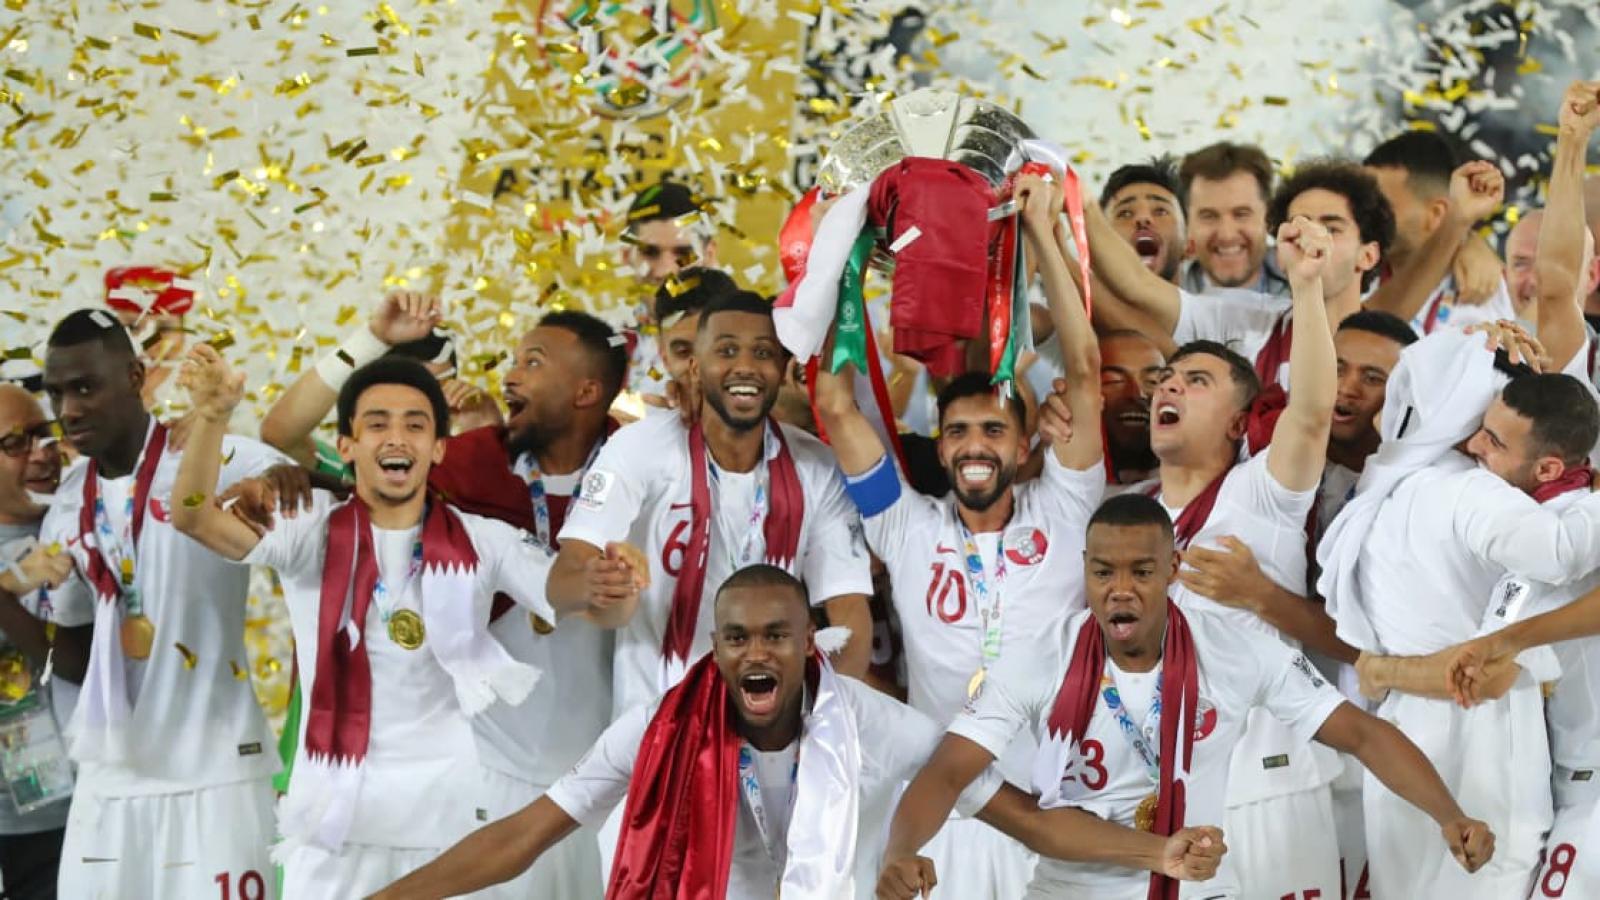 The FIFA has praised Qatar's footballing achievements